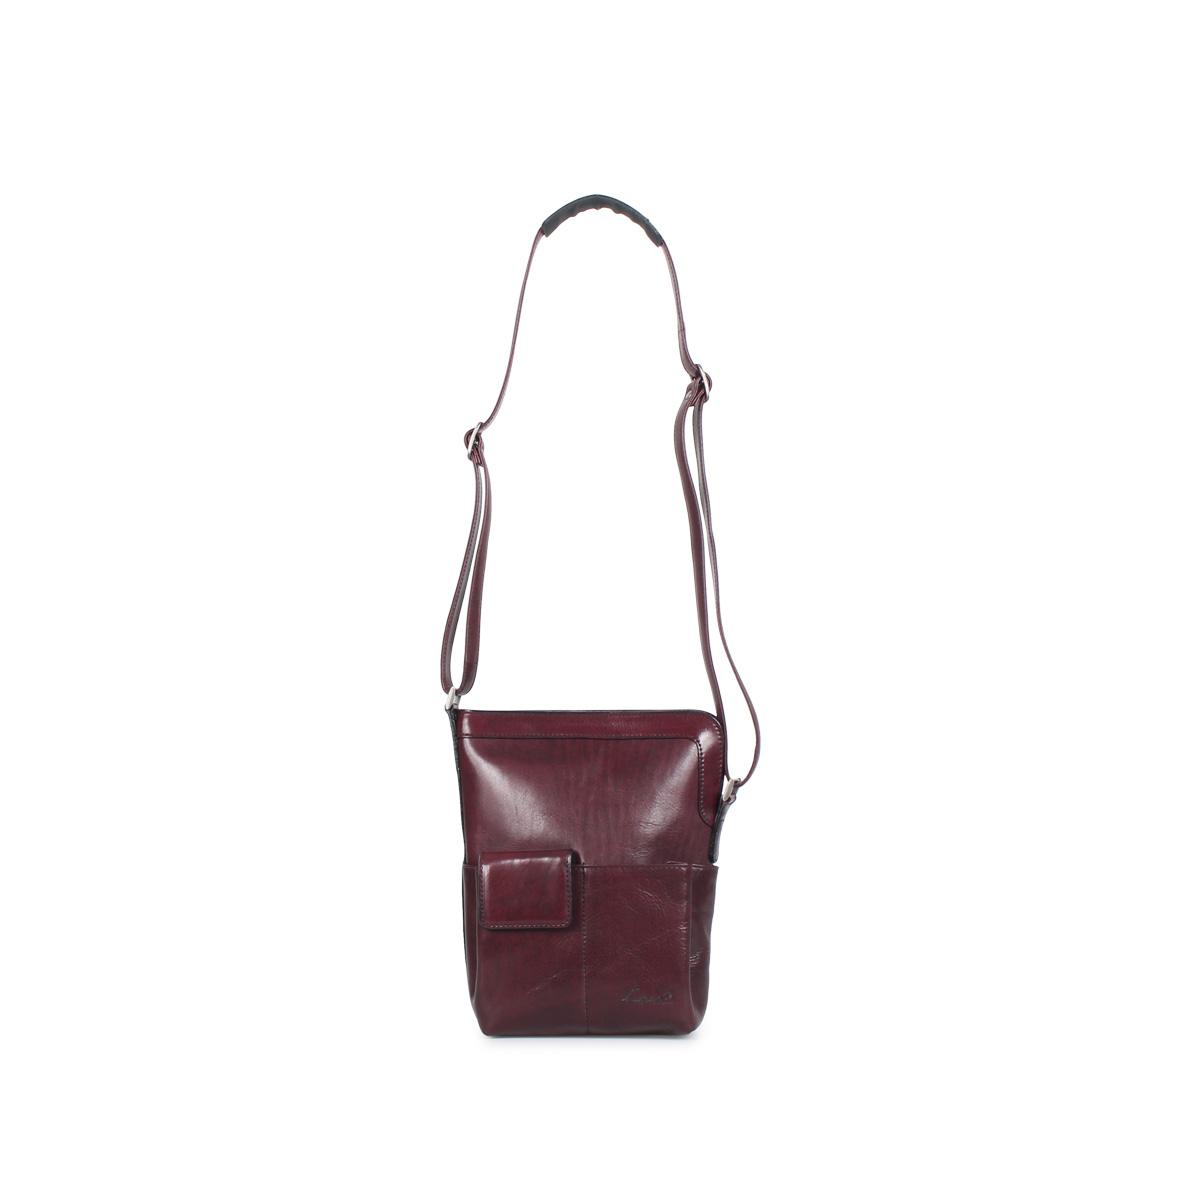 Lugard G3 SHOULDER BAG ラガード 青木鞄 ジースリー バッグ ショルダーバッグ メンズ ネイビー ブラウン ボルドー 5215 [4/23 追加入荷]